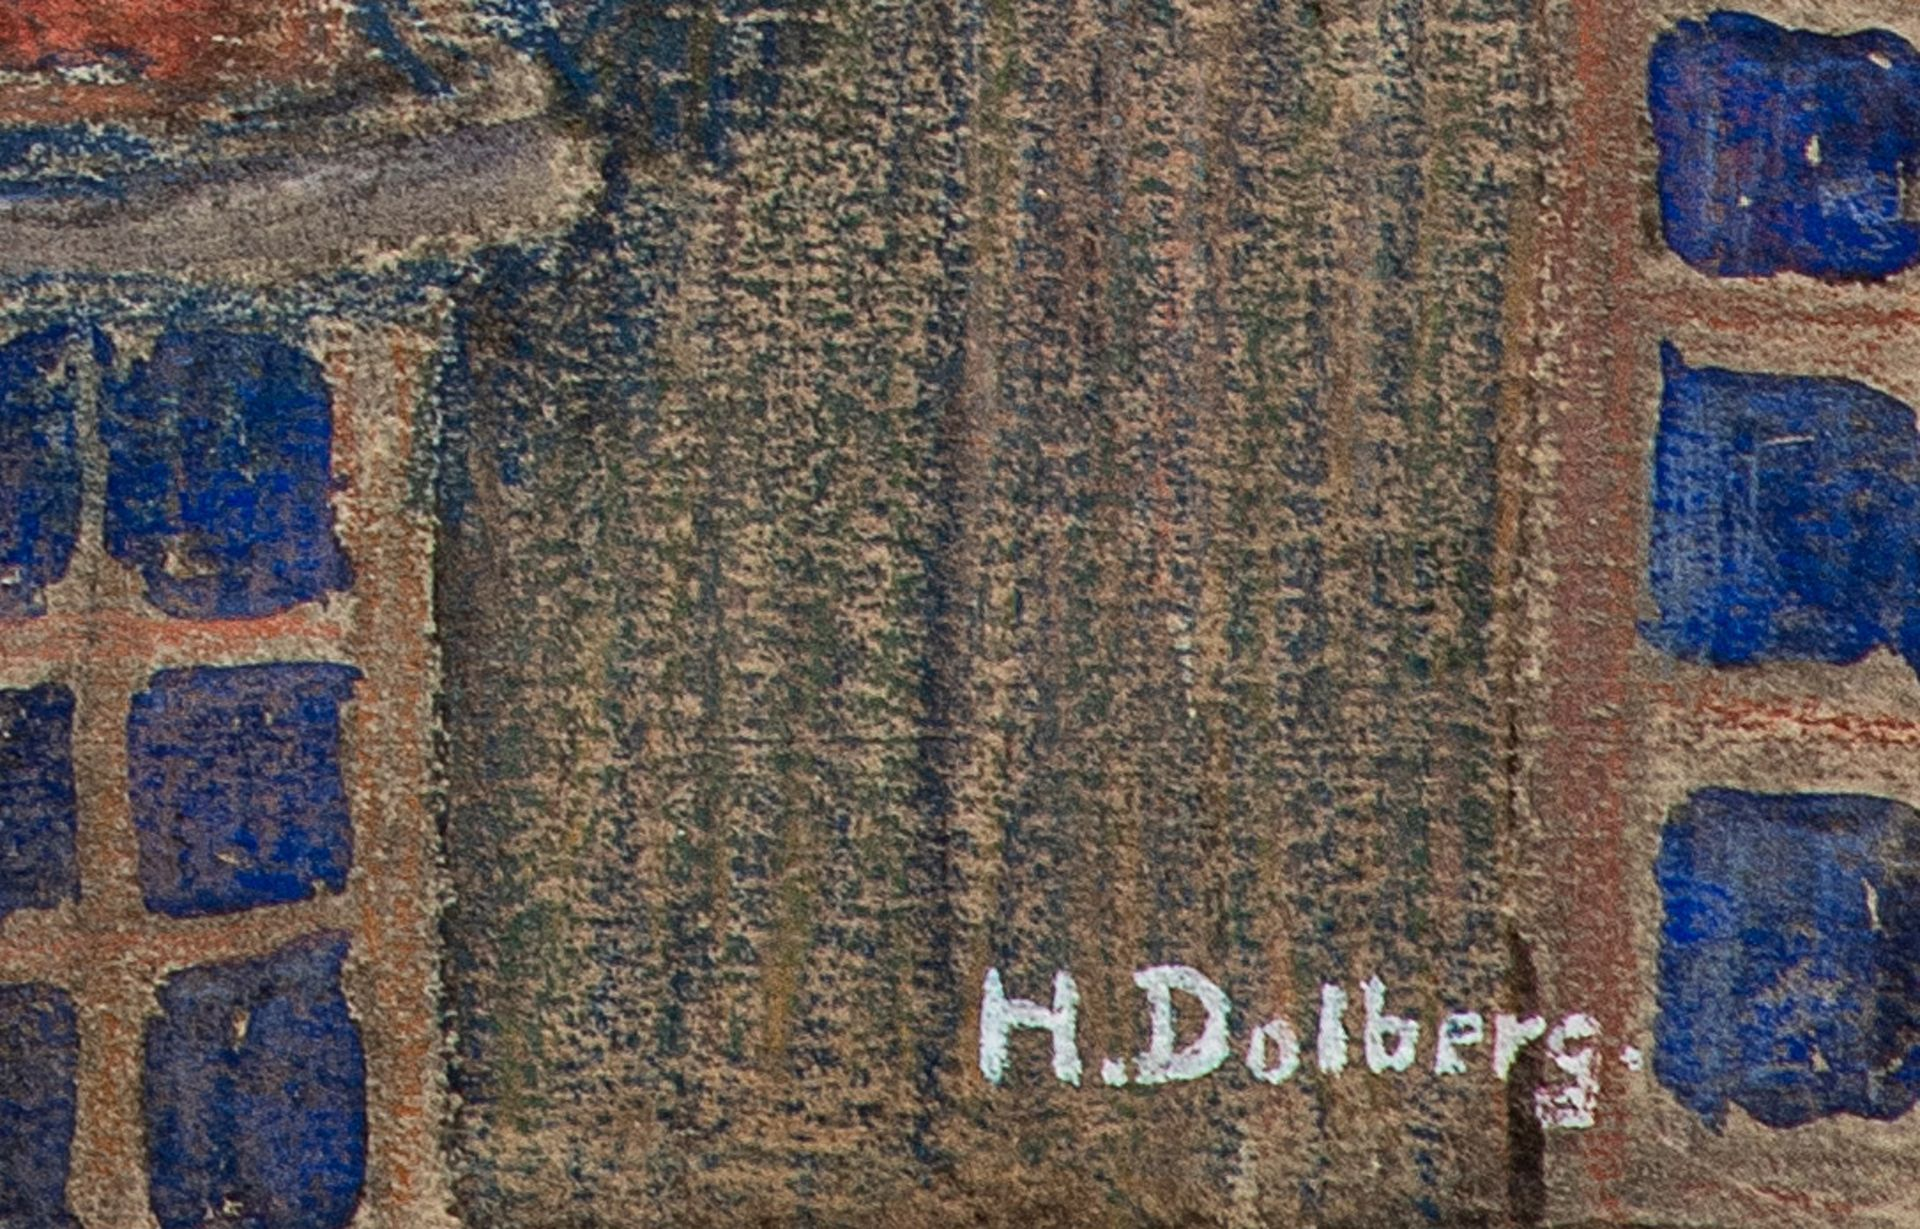 Helene Dolberg – Jakobikirche Rostock. o. J. - Image 2 of 2